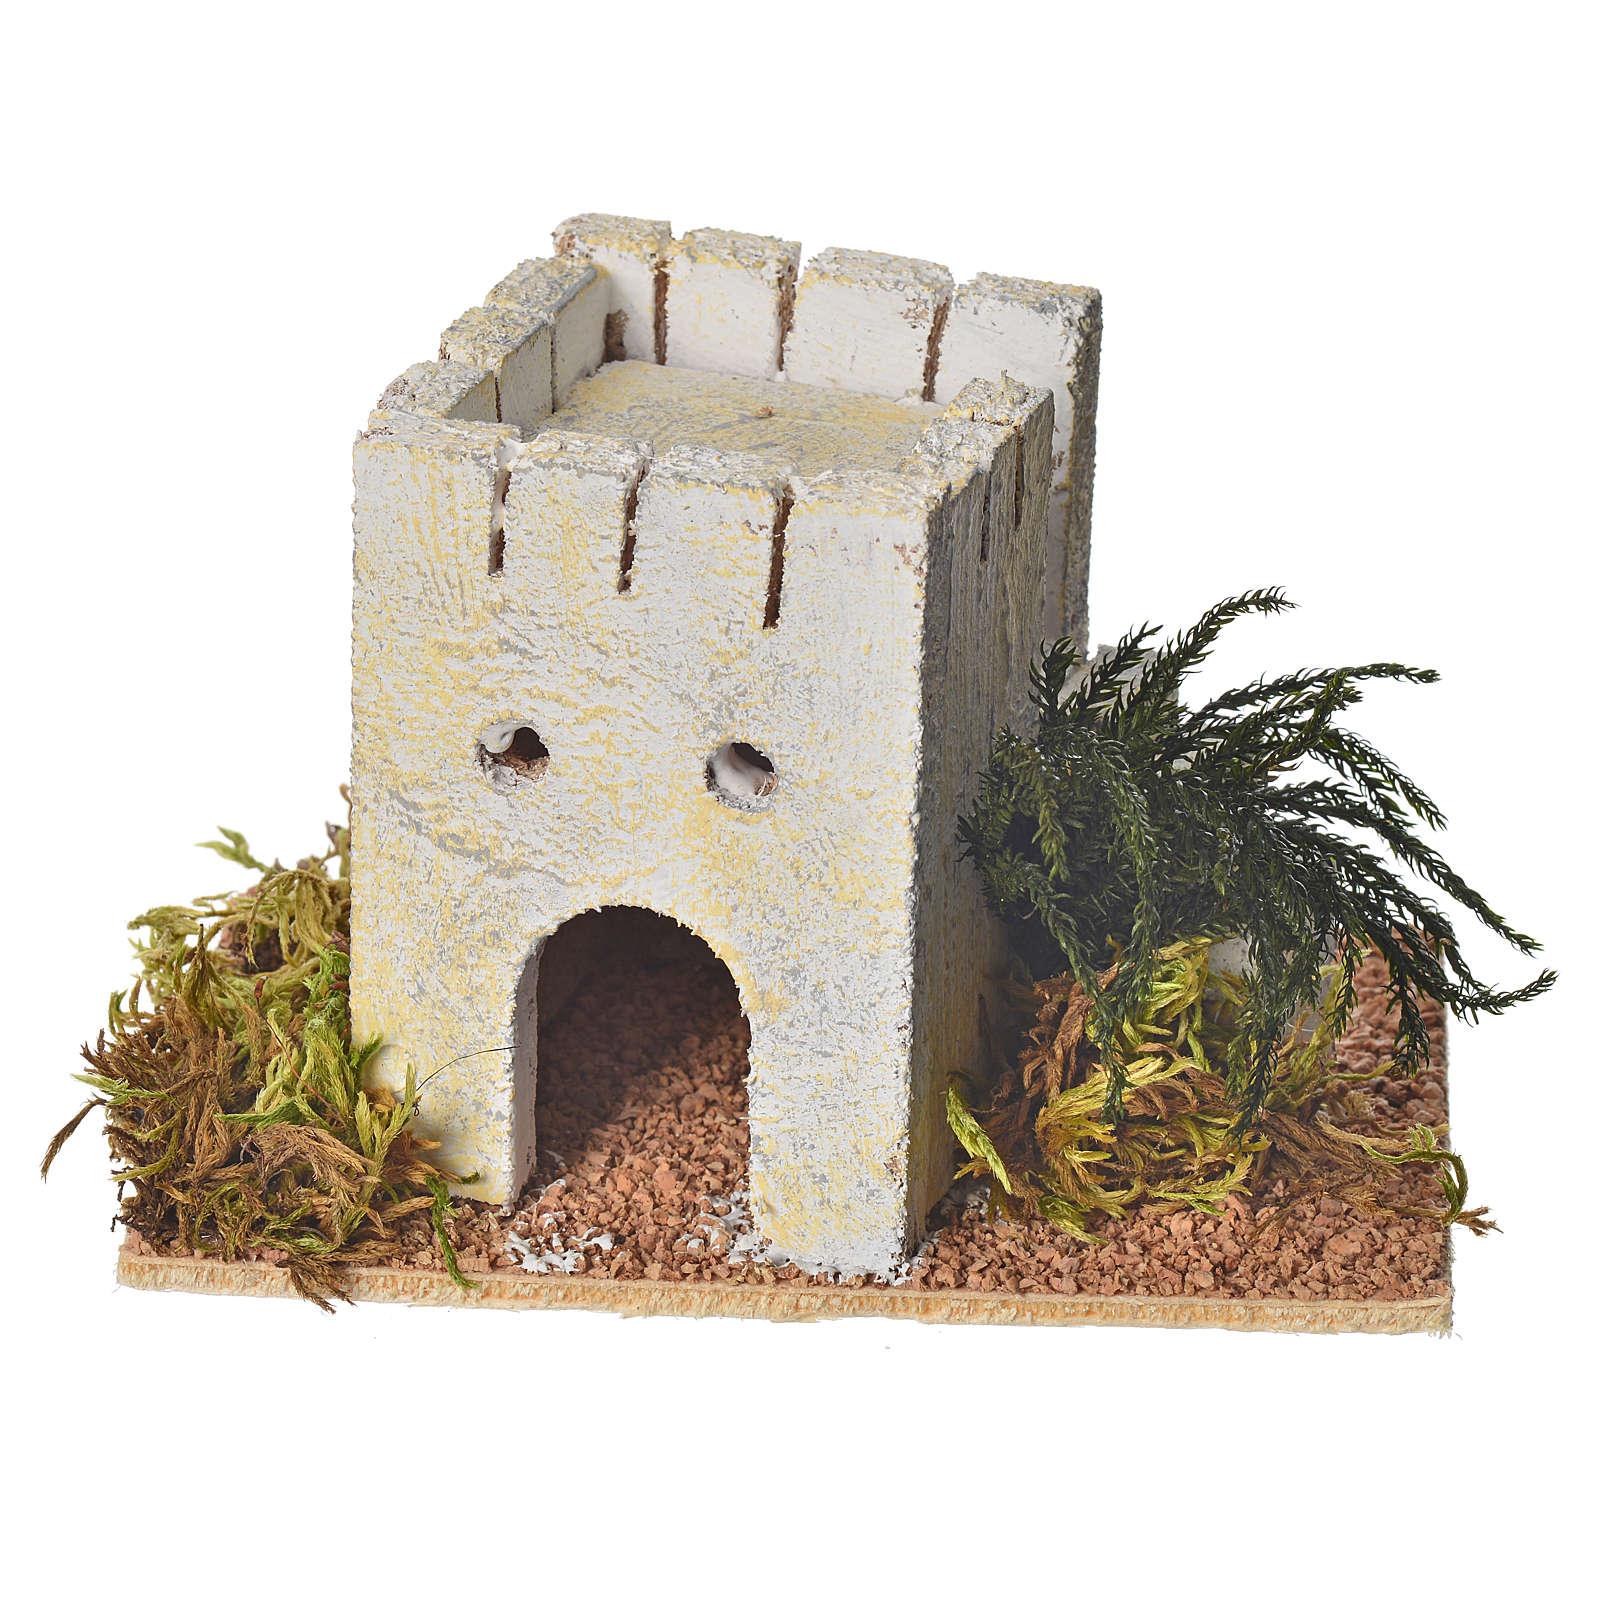 Casa araba legno per presepe 8x14x9 cm 4